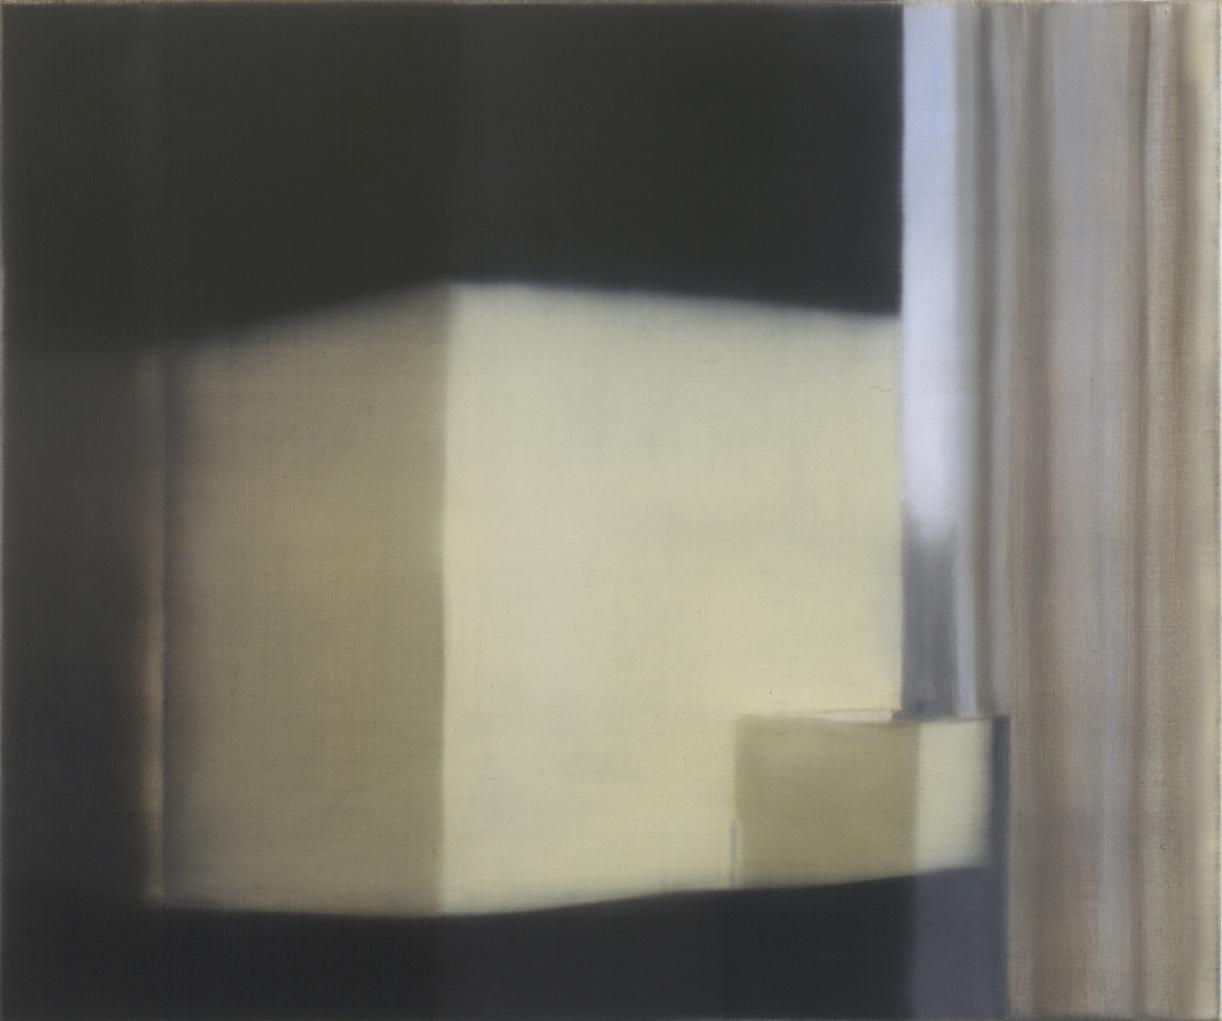 Bert de Beul, Untitled, 2006, Oil on canvas, 62 x 74 cm